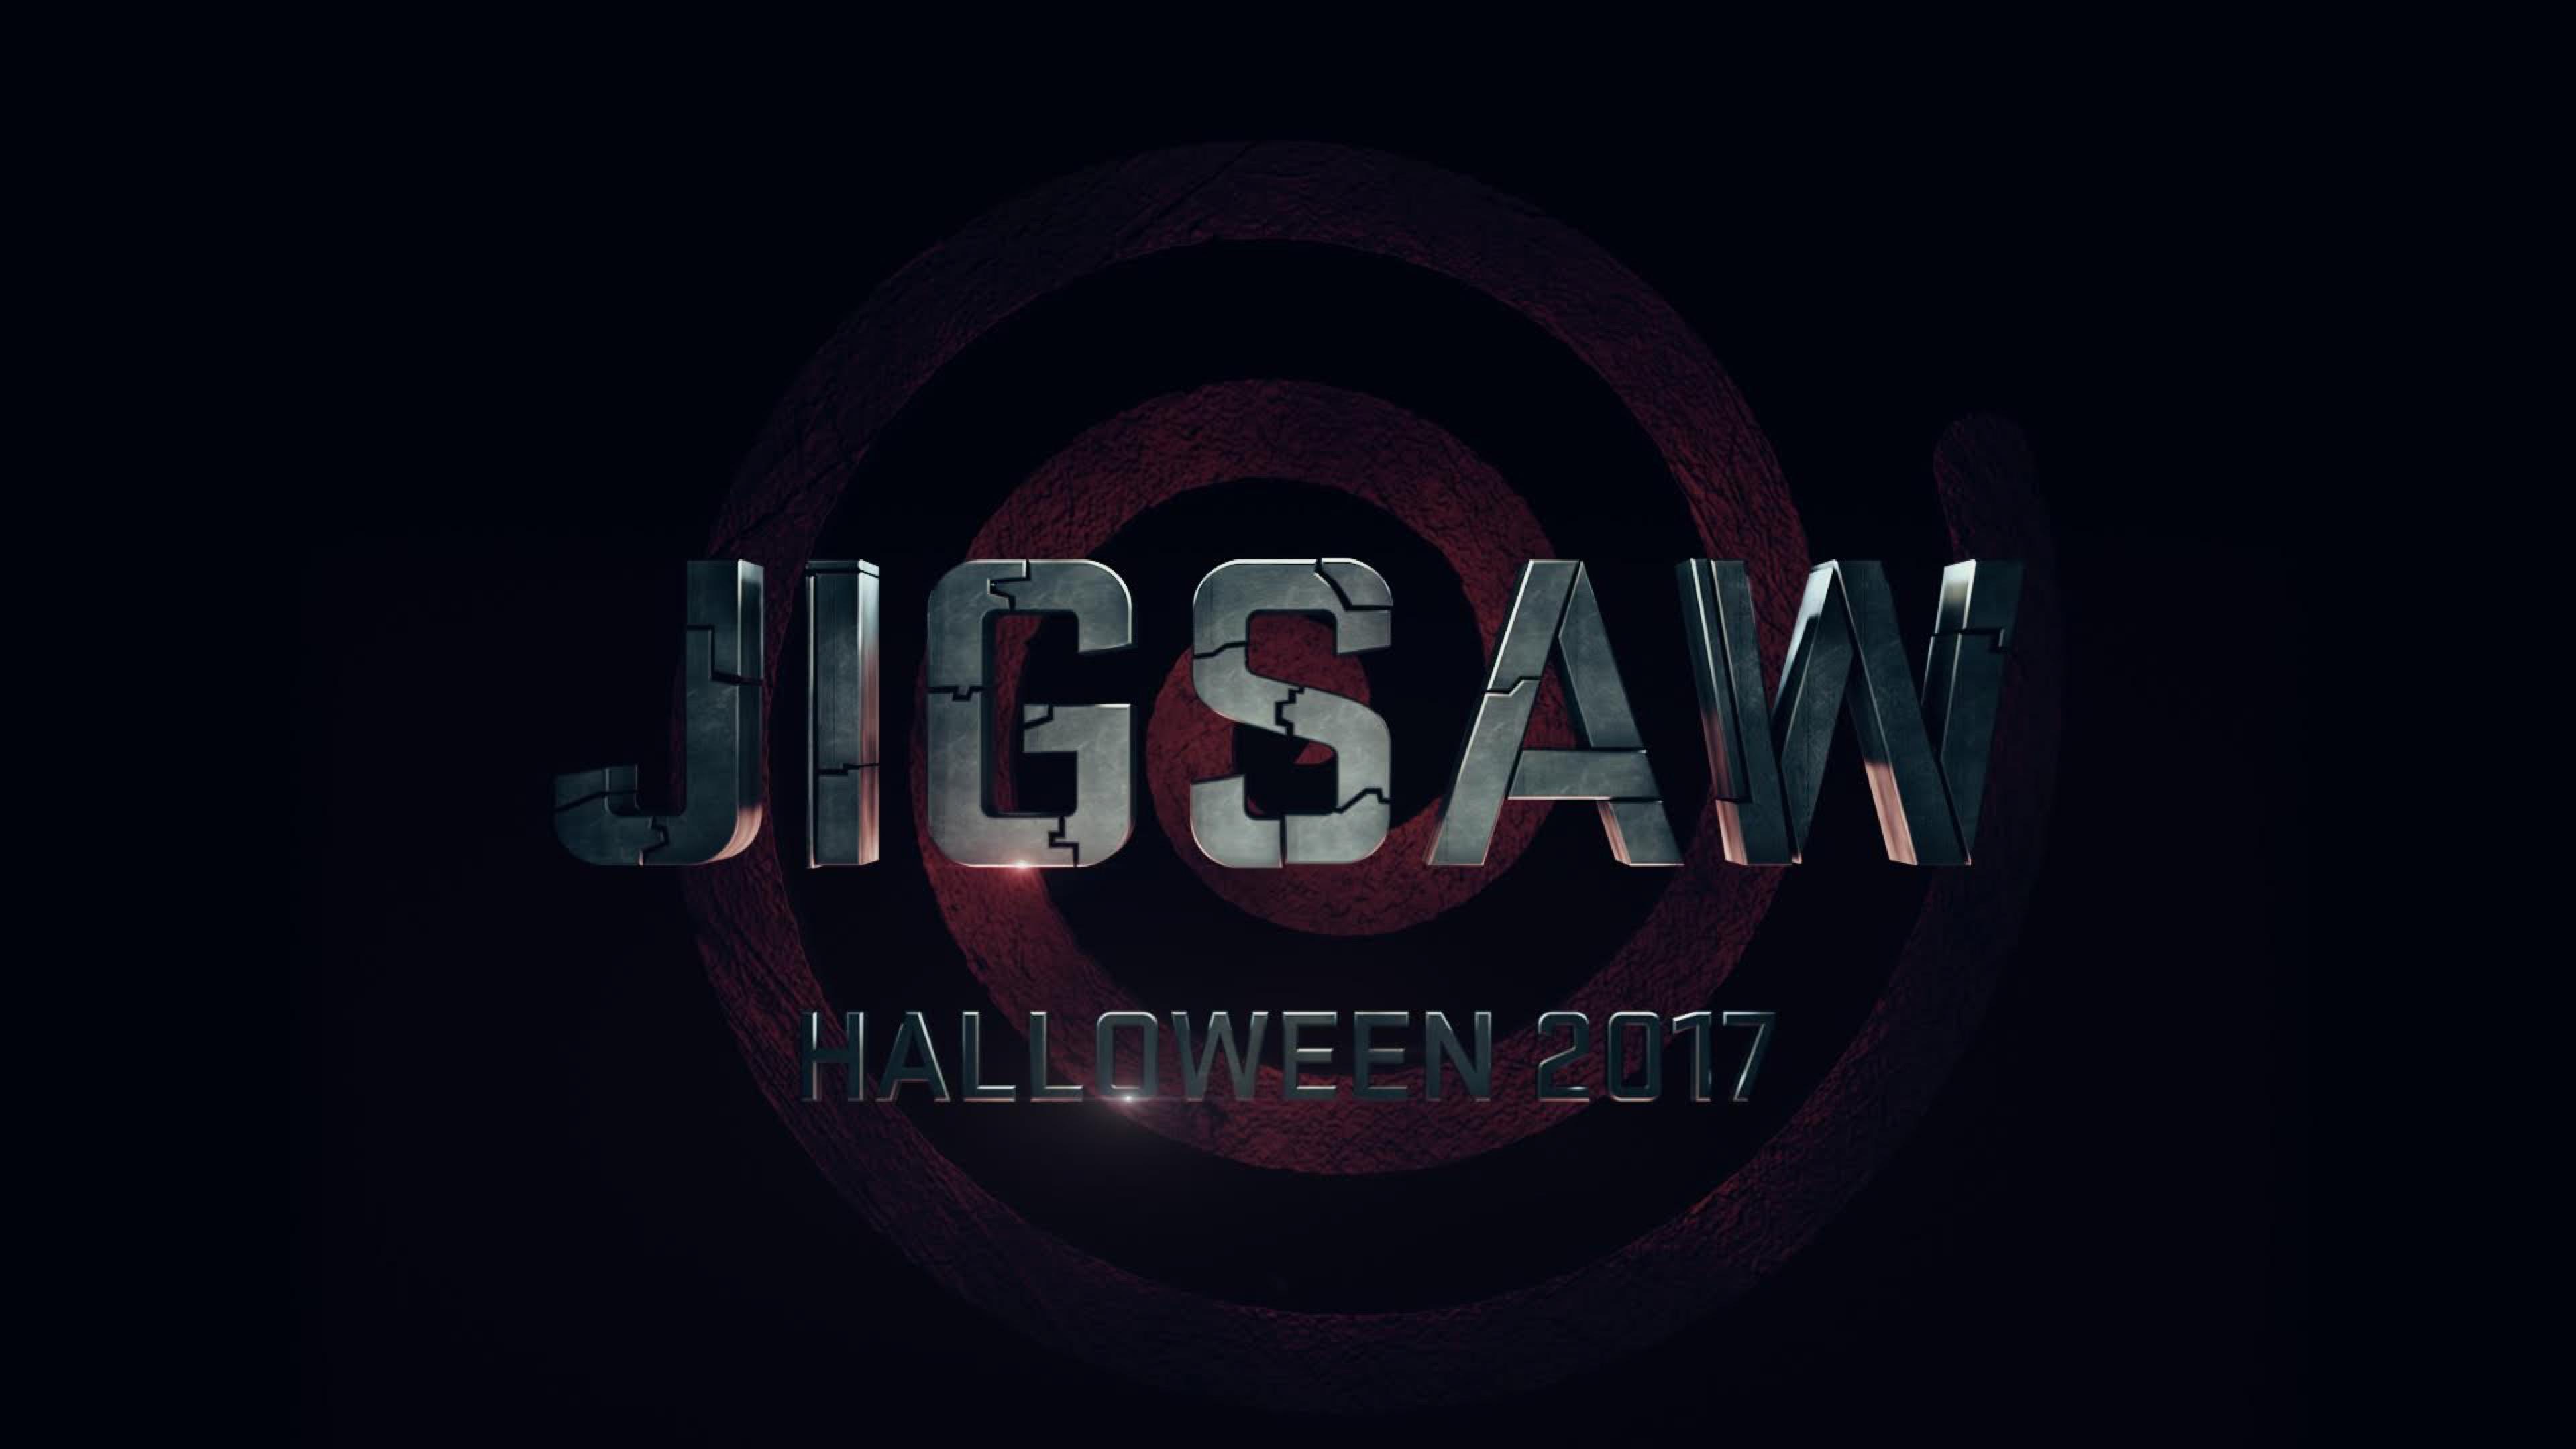 jig saw design